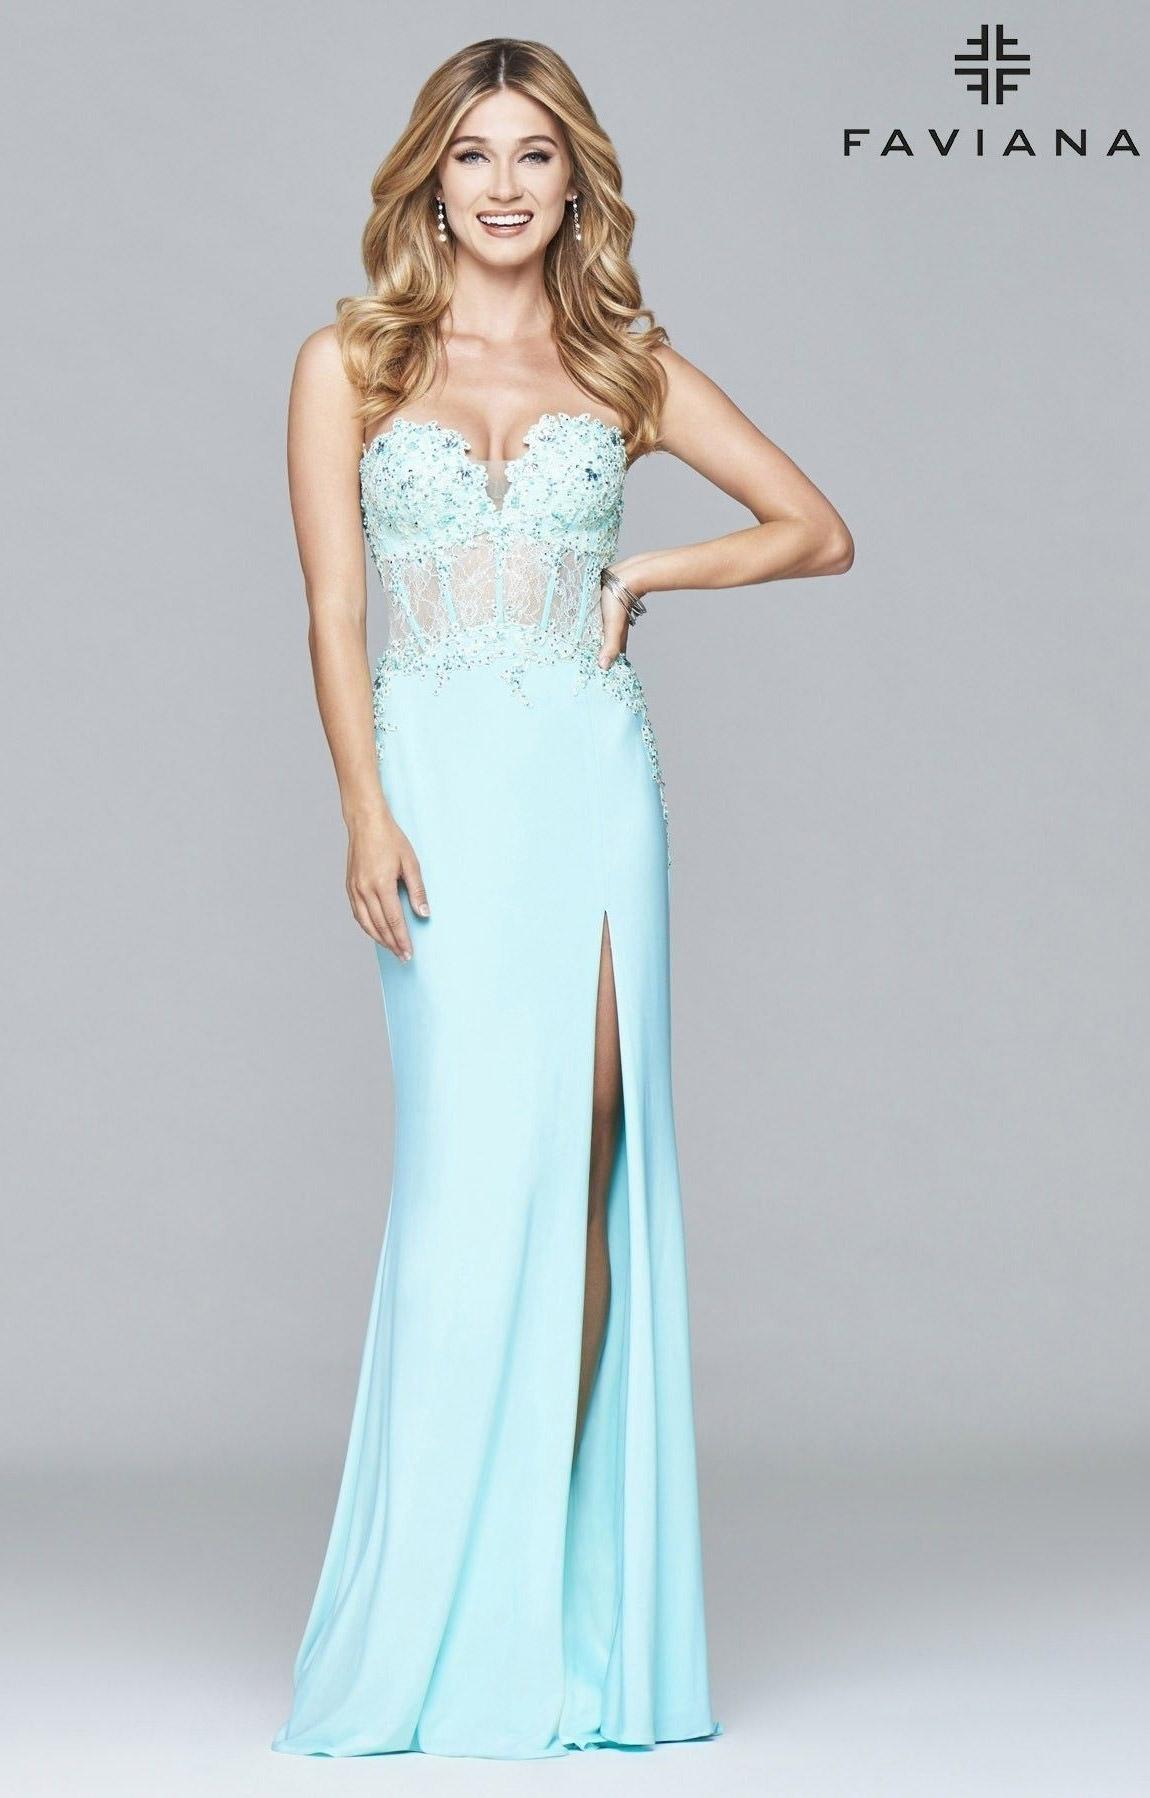 Faviana 9412 - Designer Formal Prom Dress